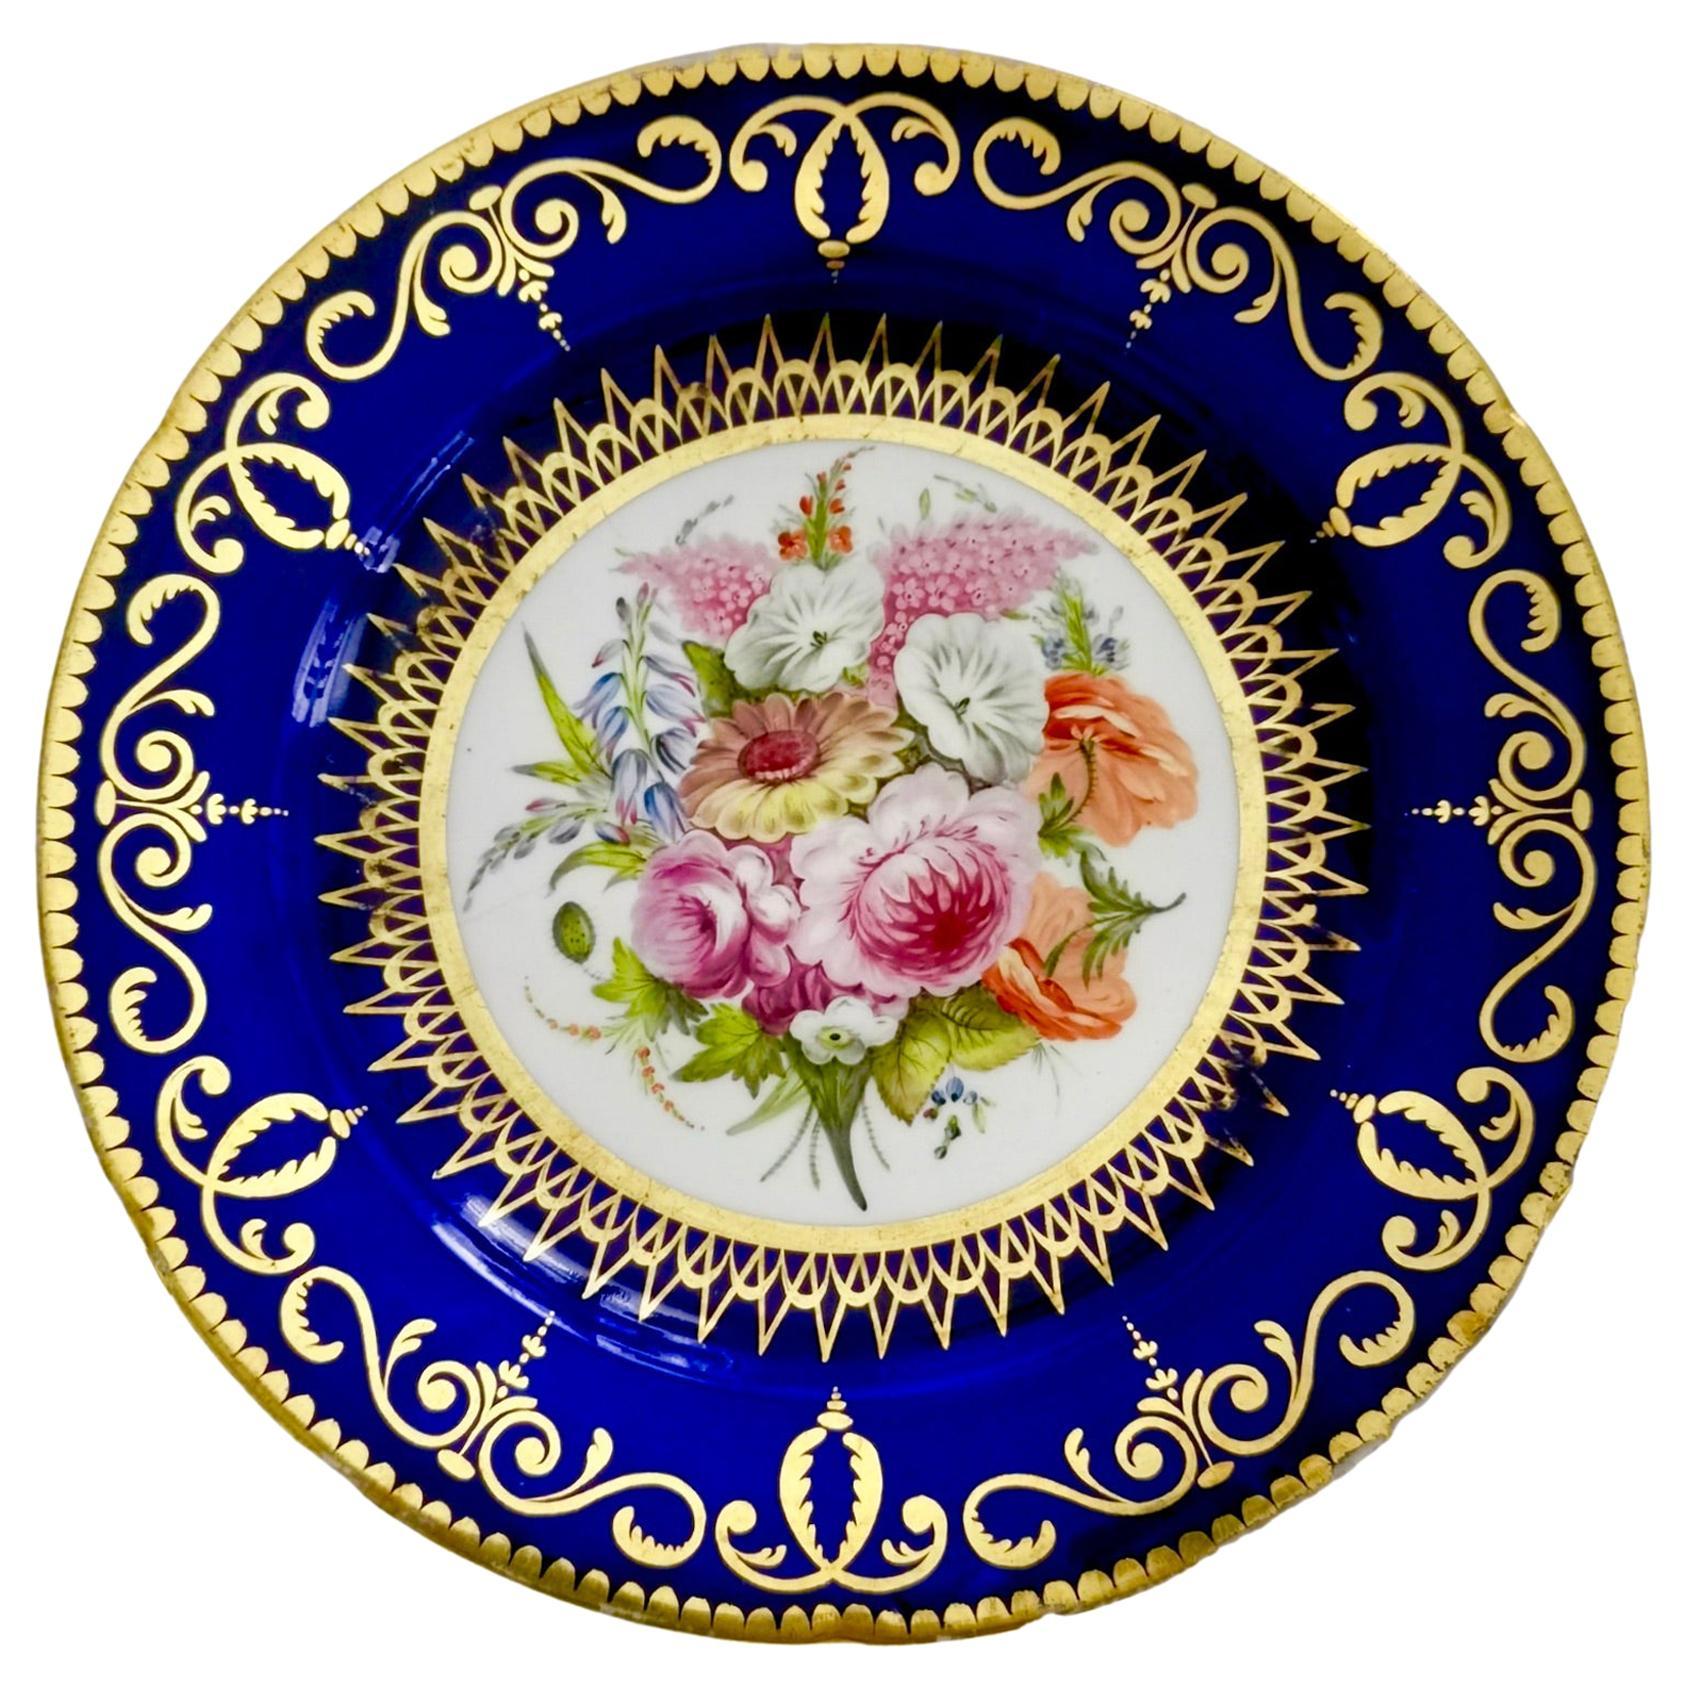 Coalport John Rose Porcelain Plate, Cobalt Blue and Flowers, Regency 1805-1810